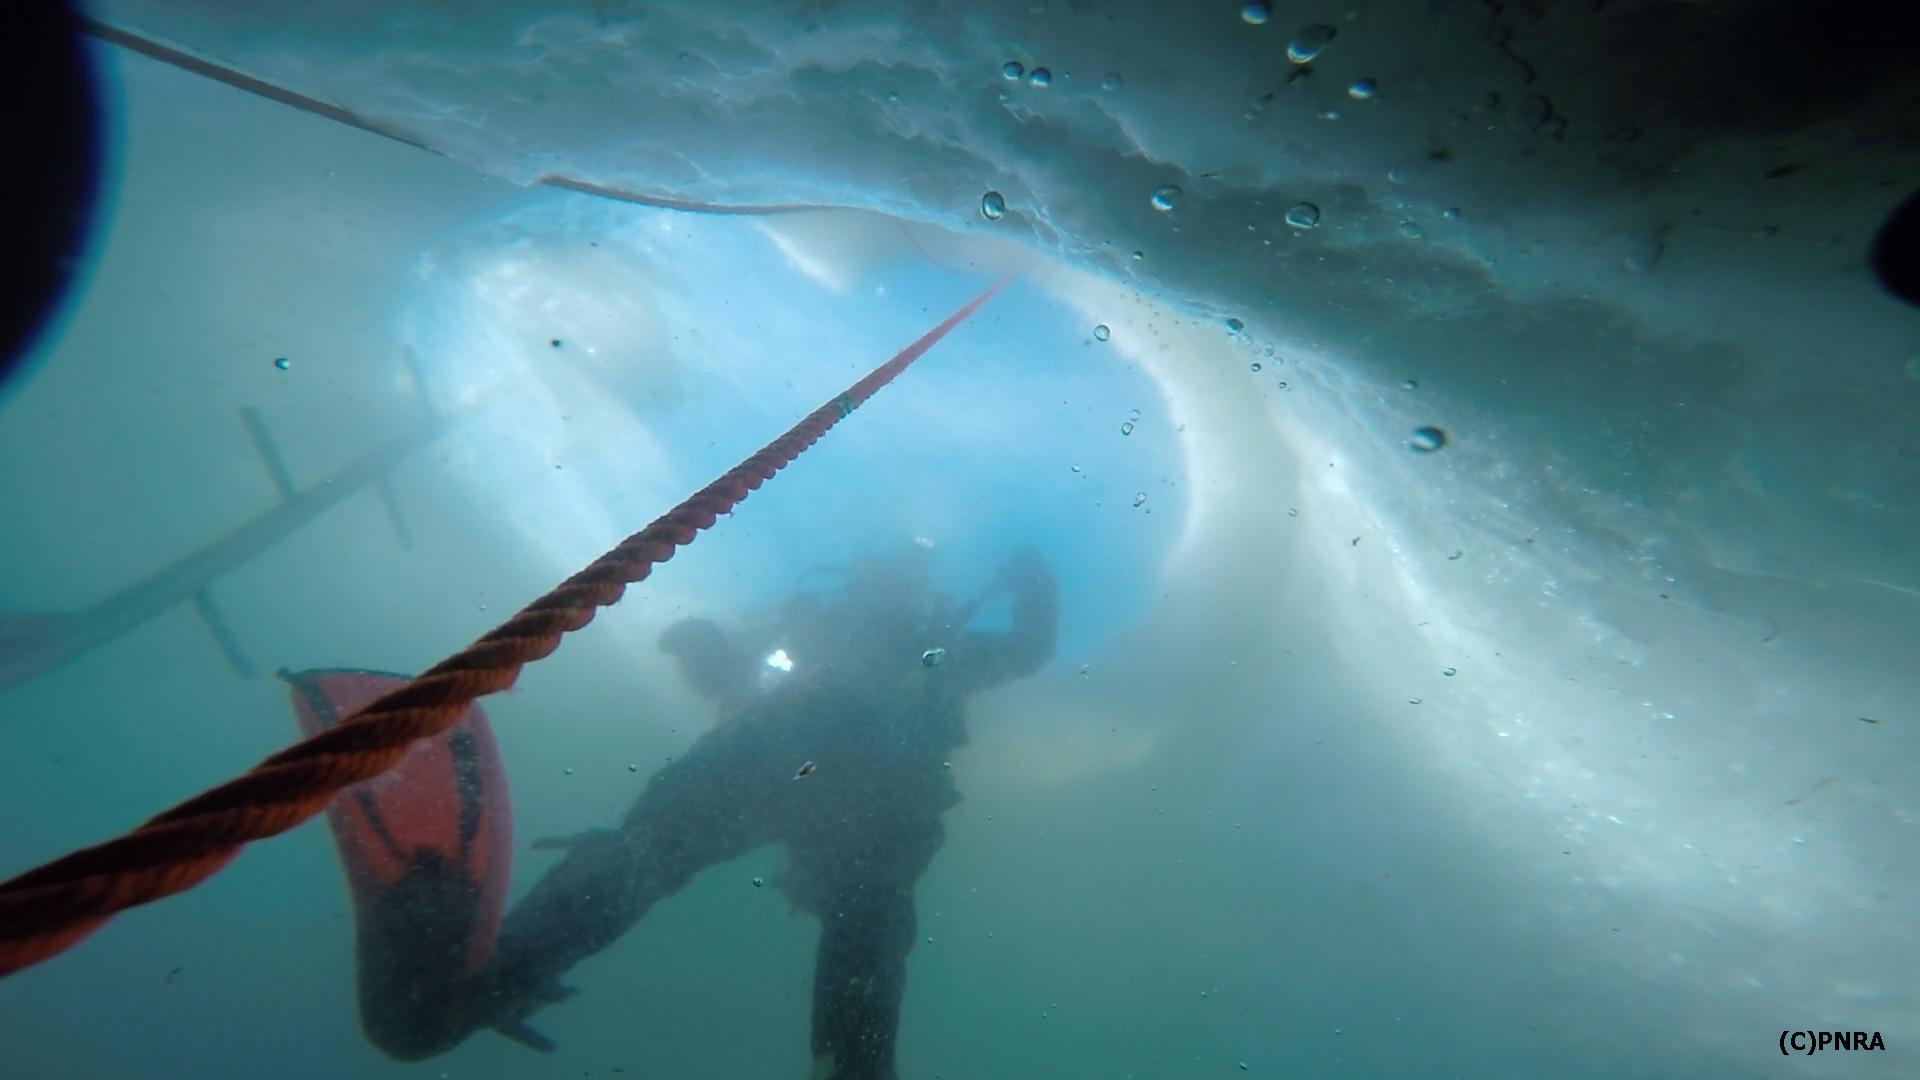 Antartide - Immersione